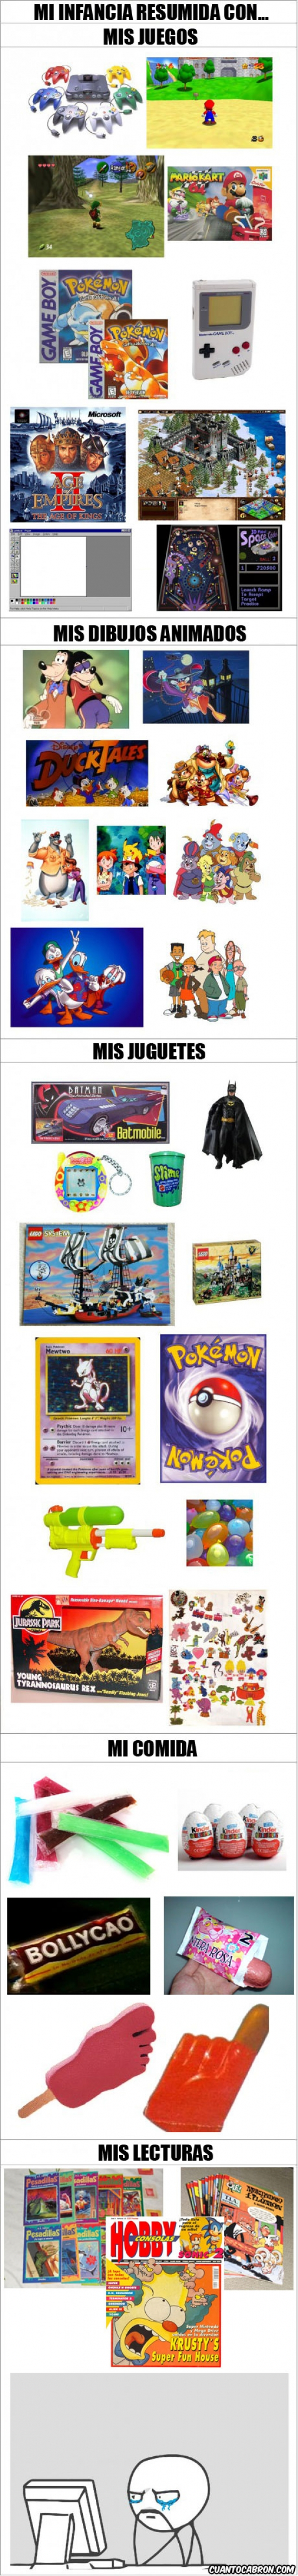 Mi infancia resumida